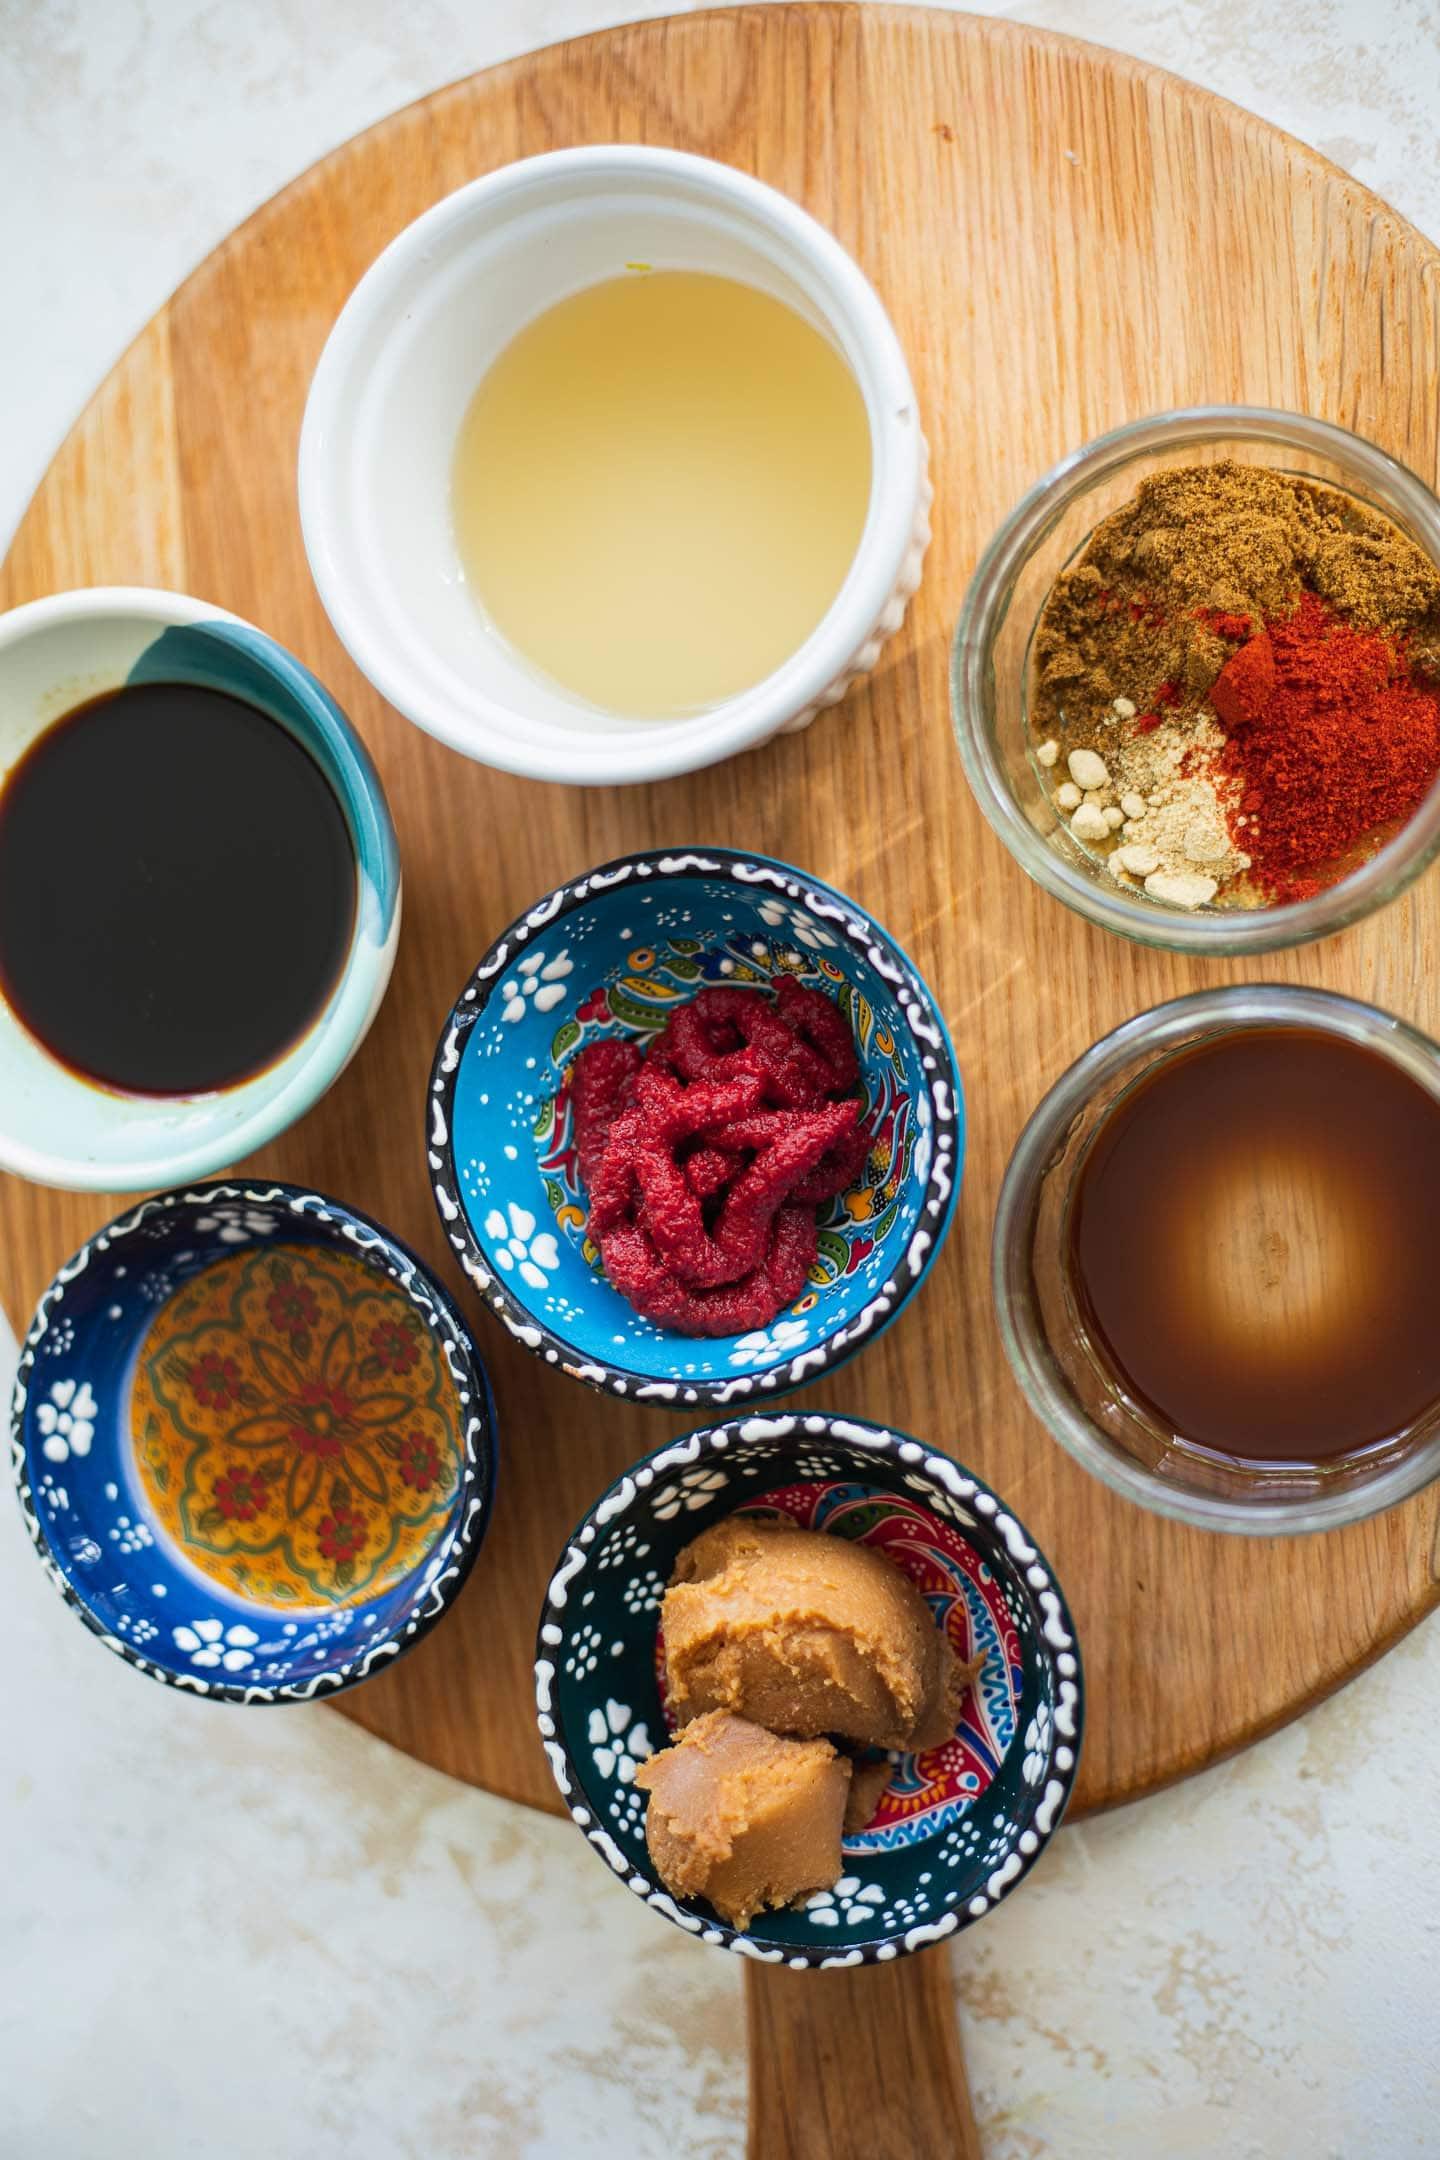 Ingredients for a vegan miso glaze